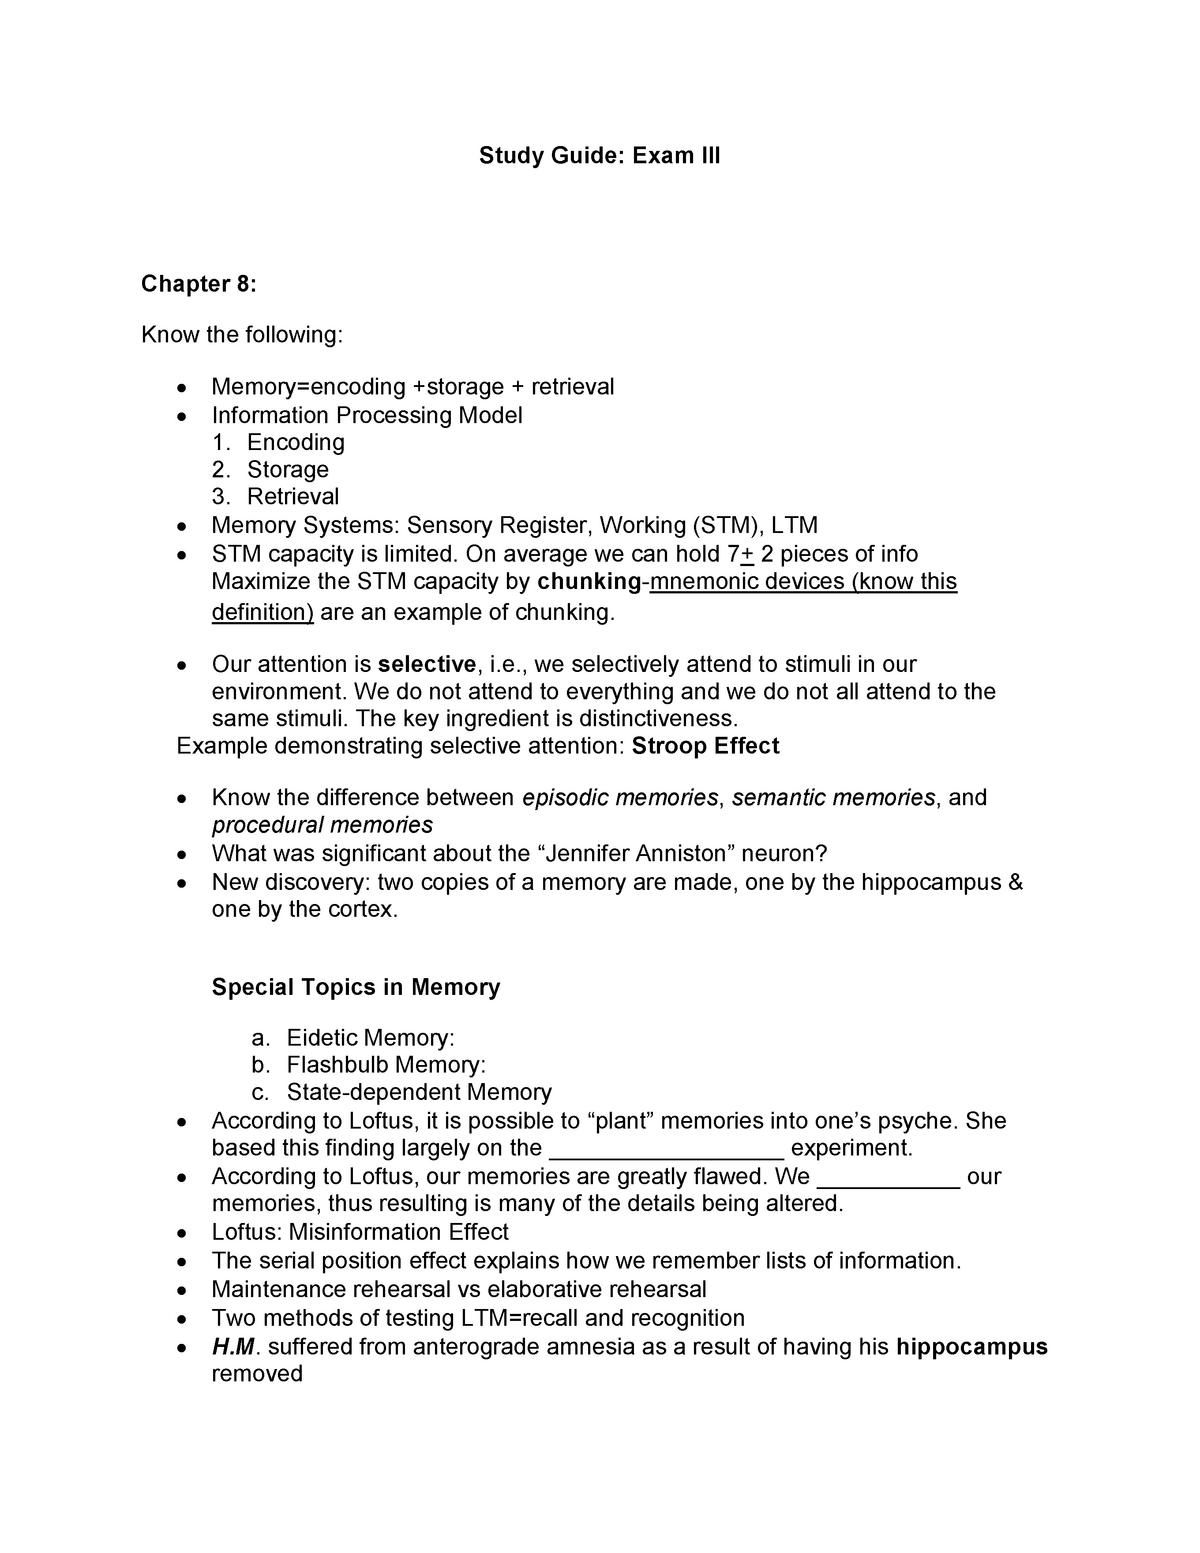 Study Exam III Spring 18 - PSYC 1101 - StuDocu